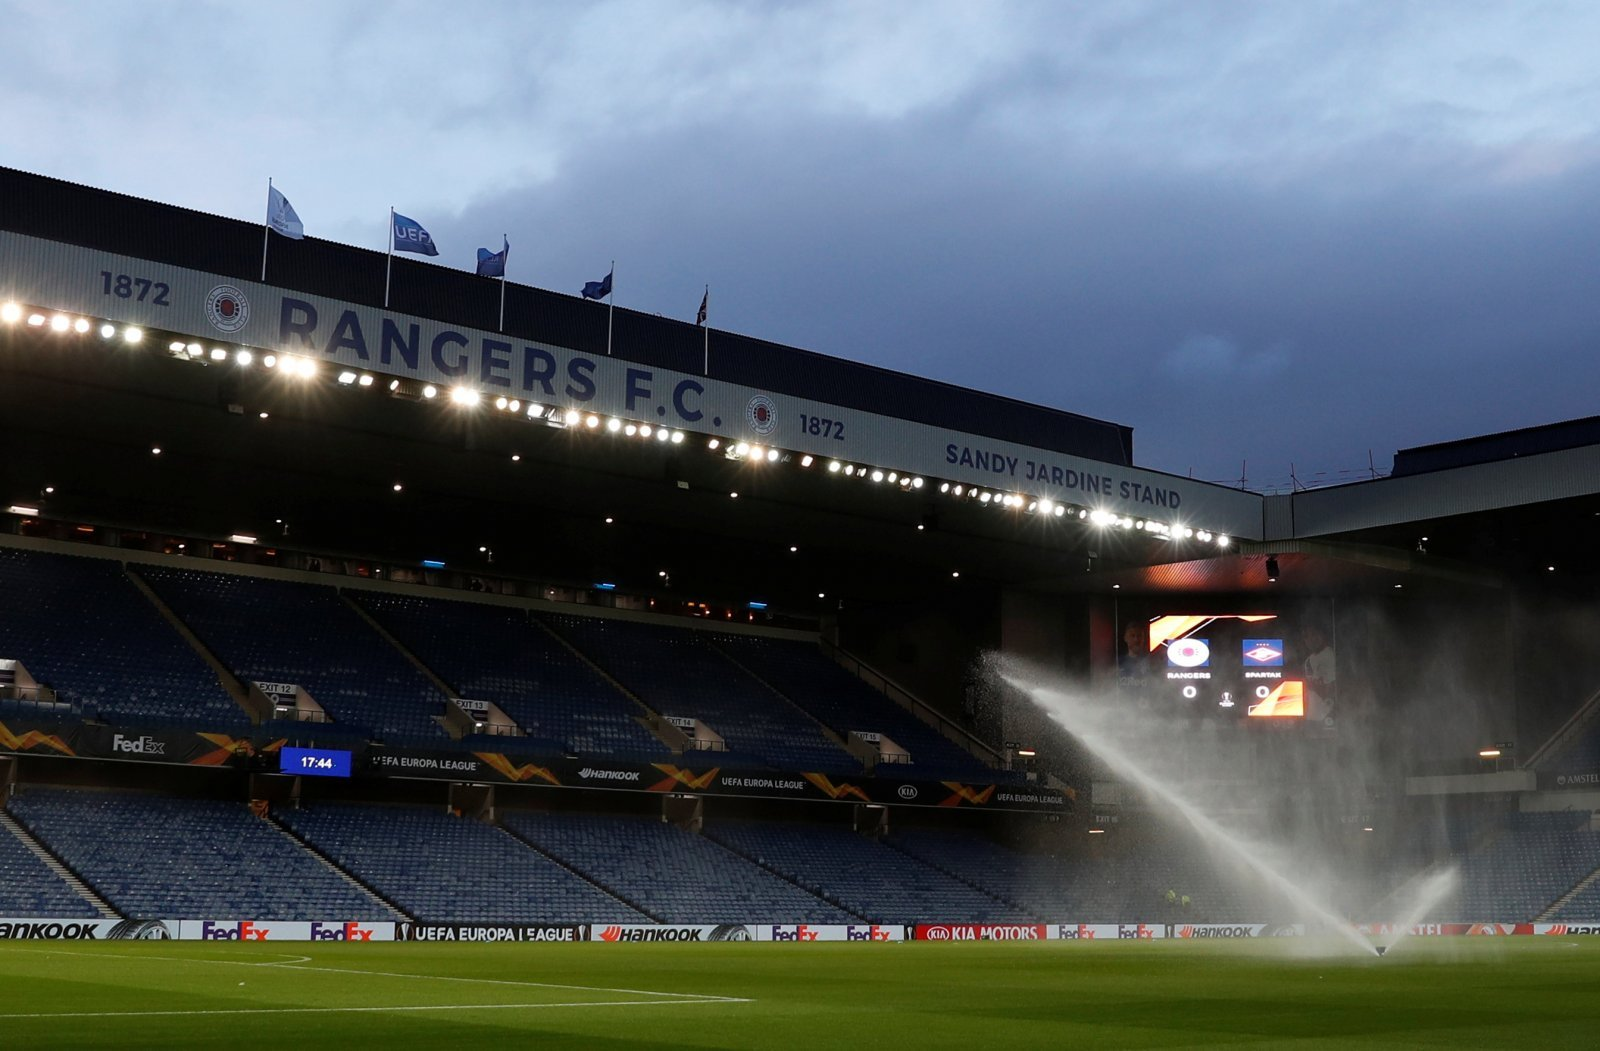 Gers set to complete deal for Man Utd midfielder